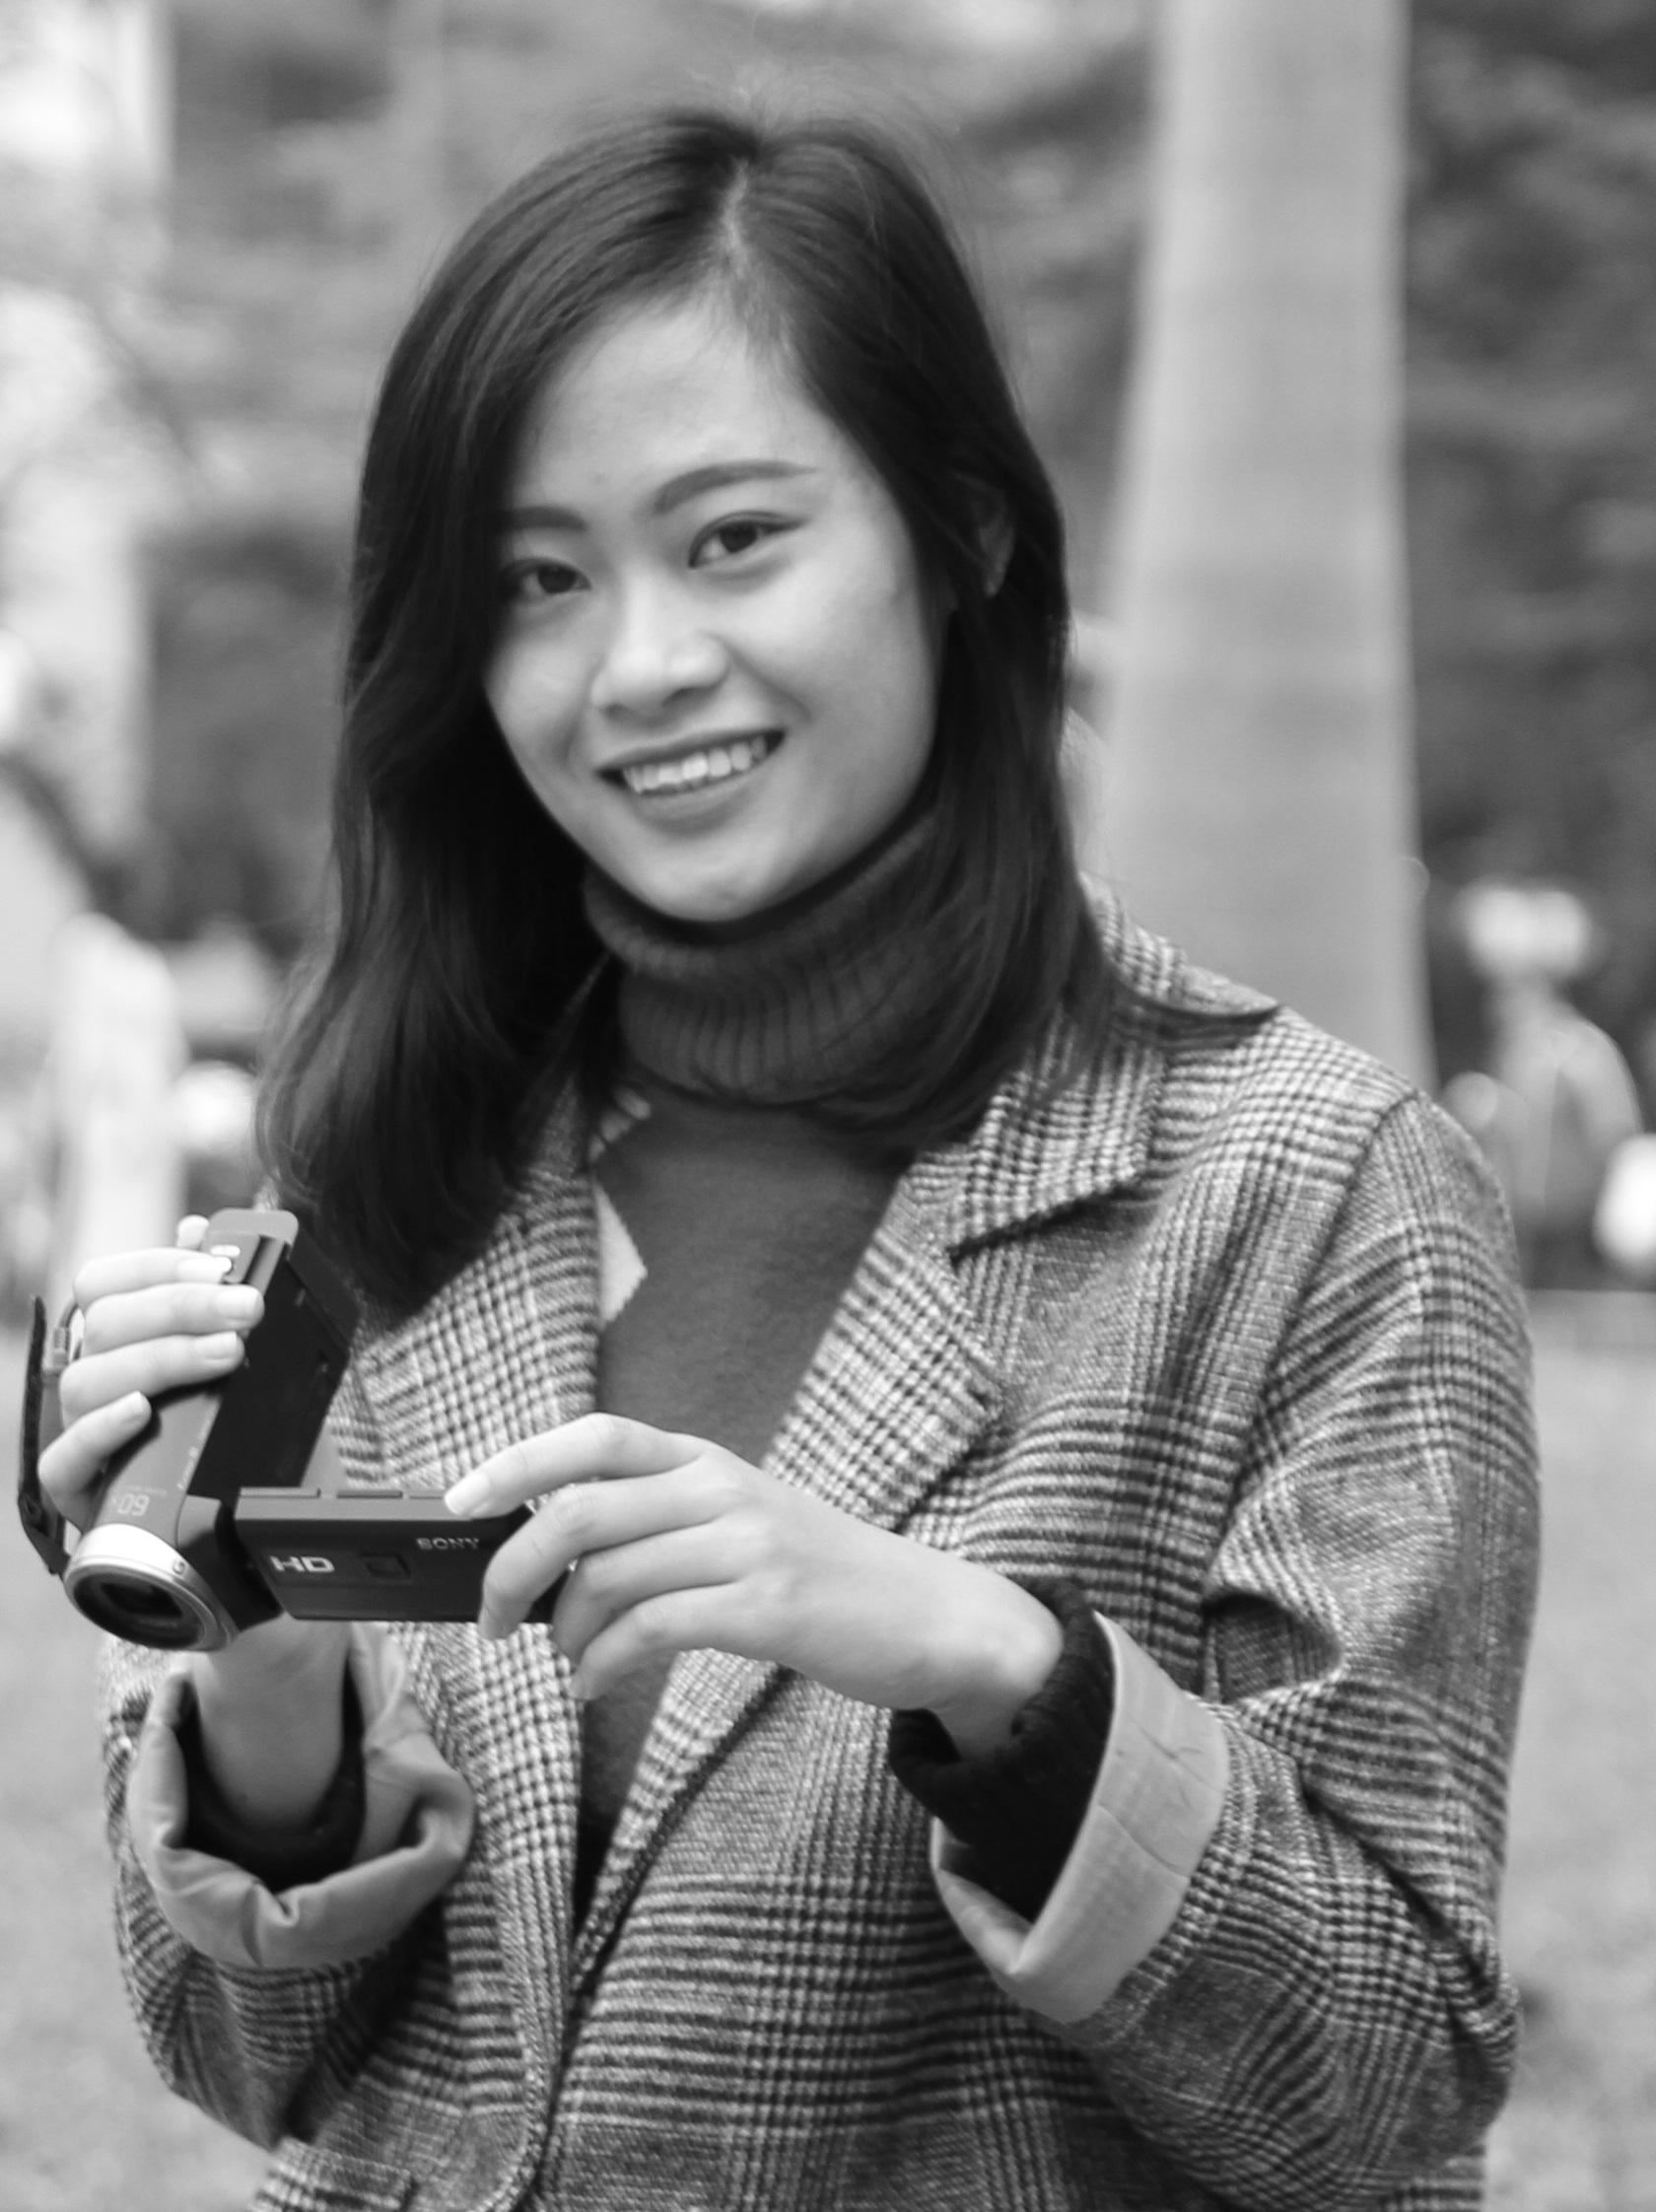 Nguyễn Thuỳ Trang - Accountant